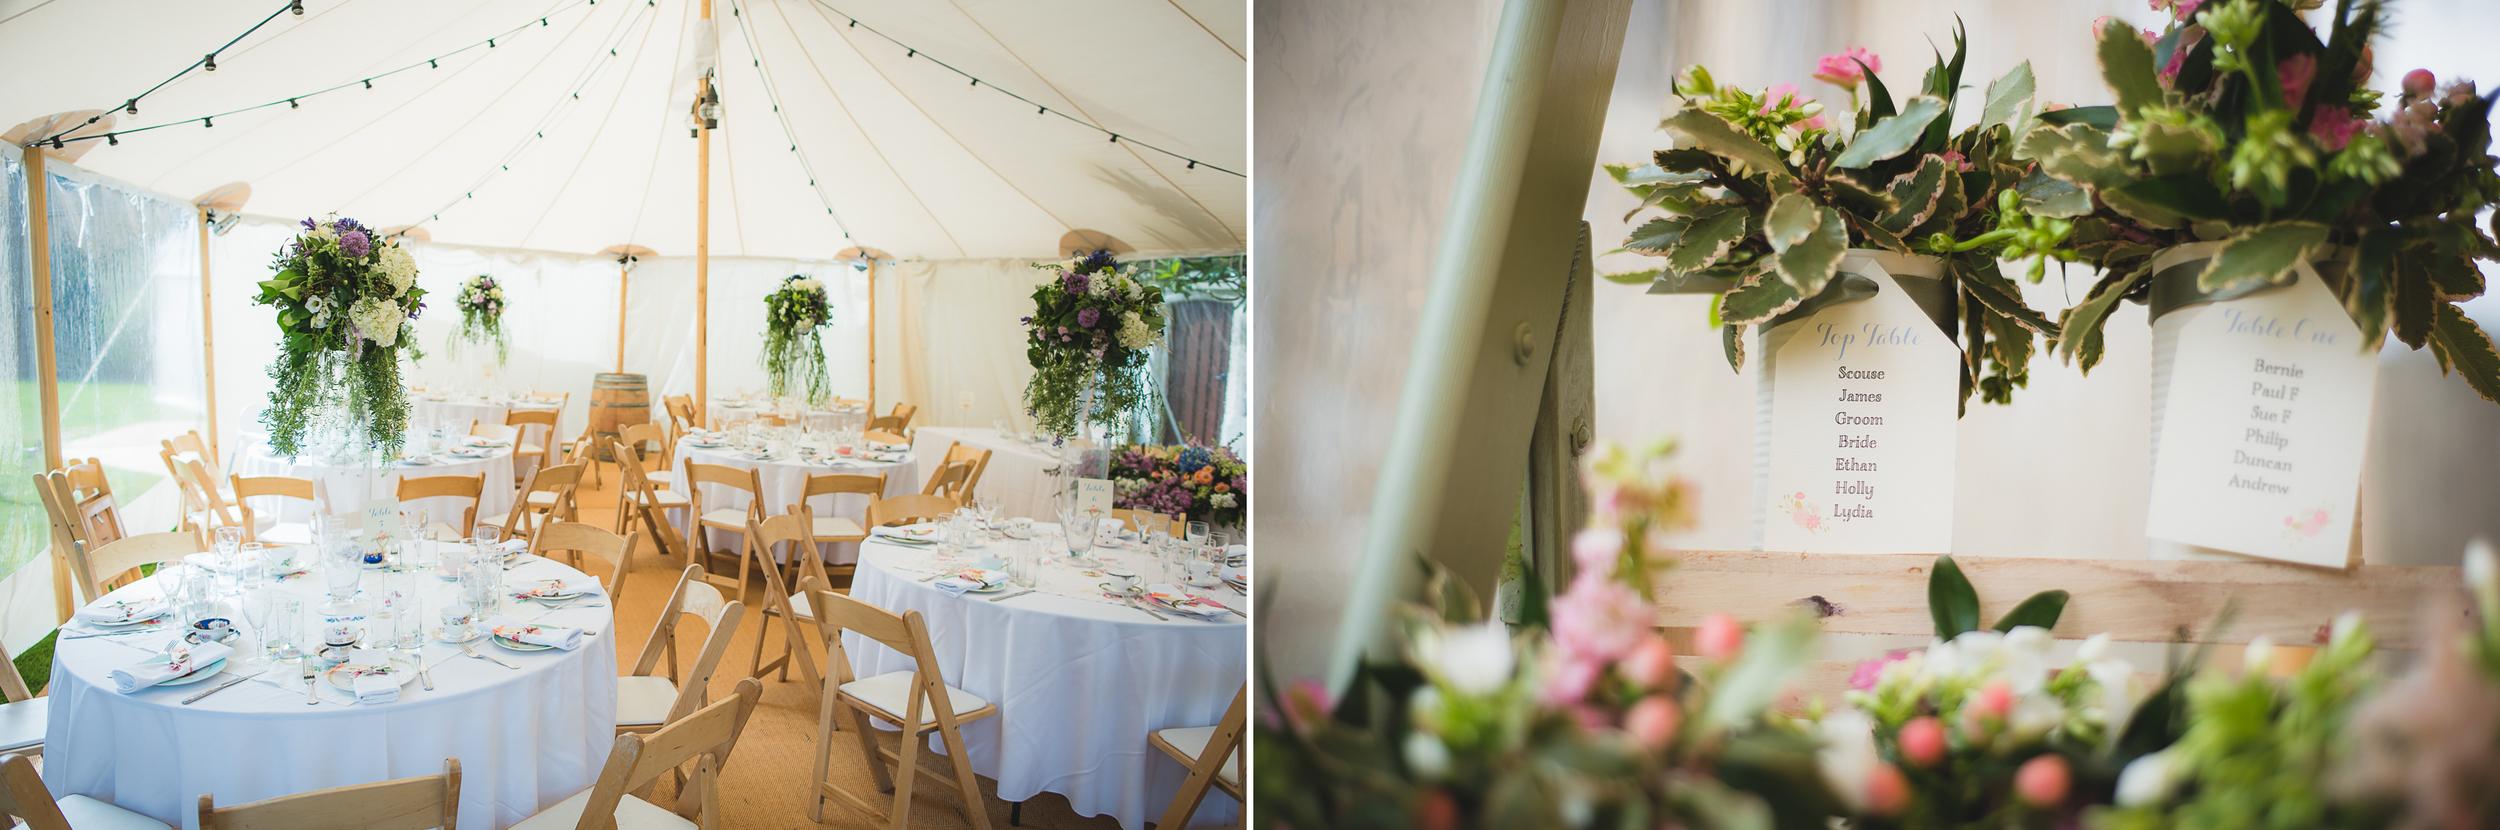 beautiful wedding flower arrangement in tipi marquee